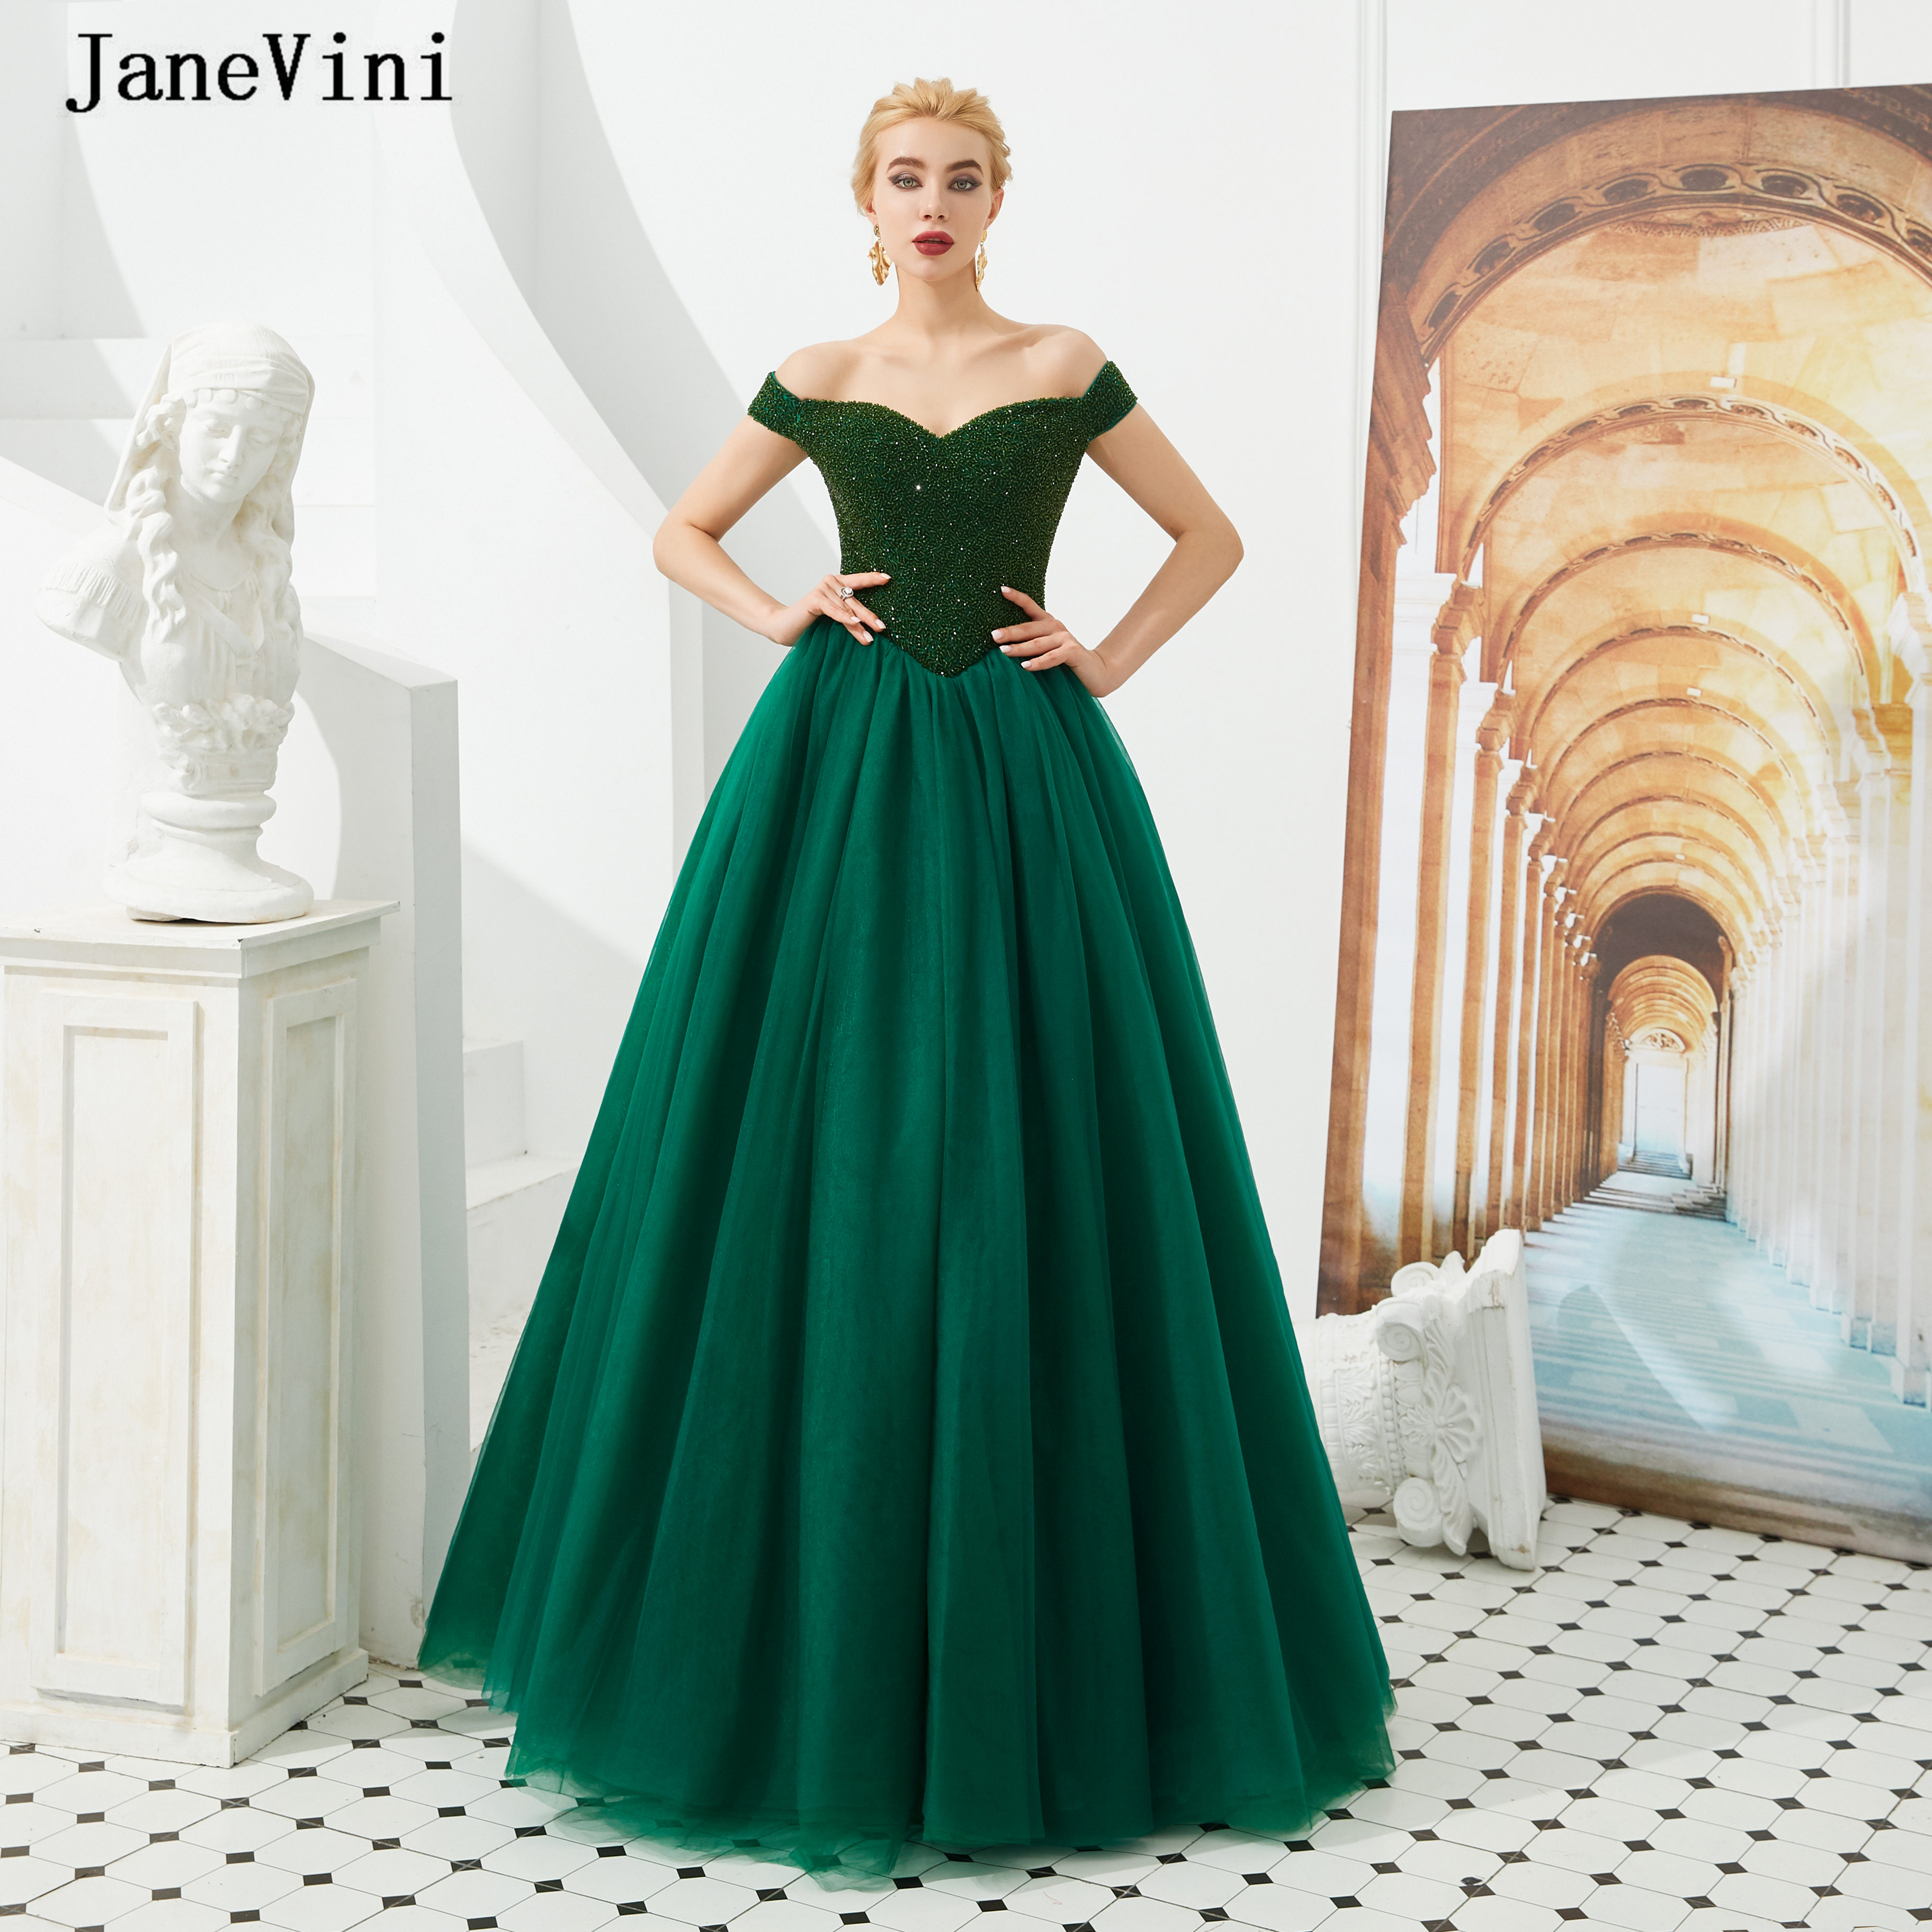 JaneVini Elegant Dark Green A Line Long   Prom     Dresses   Off Shoulder Sleeveless Puffy Tulle Luxury Beading Formal   Dress   Customize